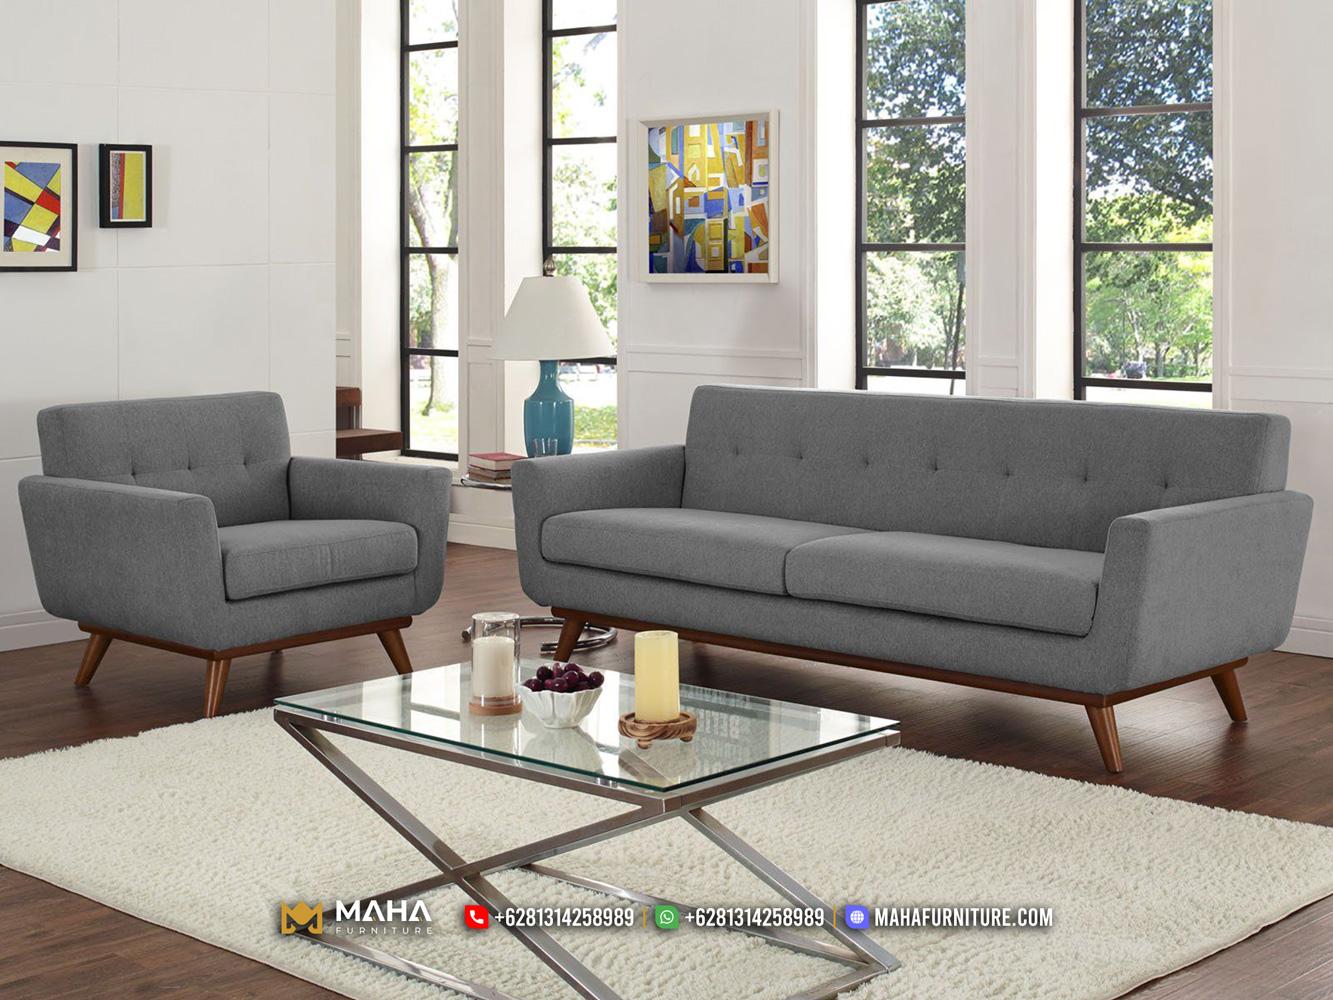 Terlaris Model Sofa Minimalis Klasik Jati Asli Jepara MF256